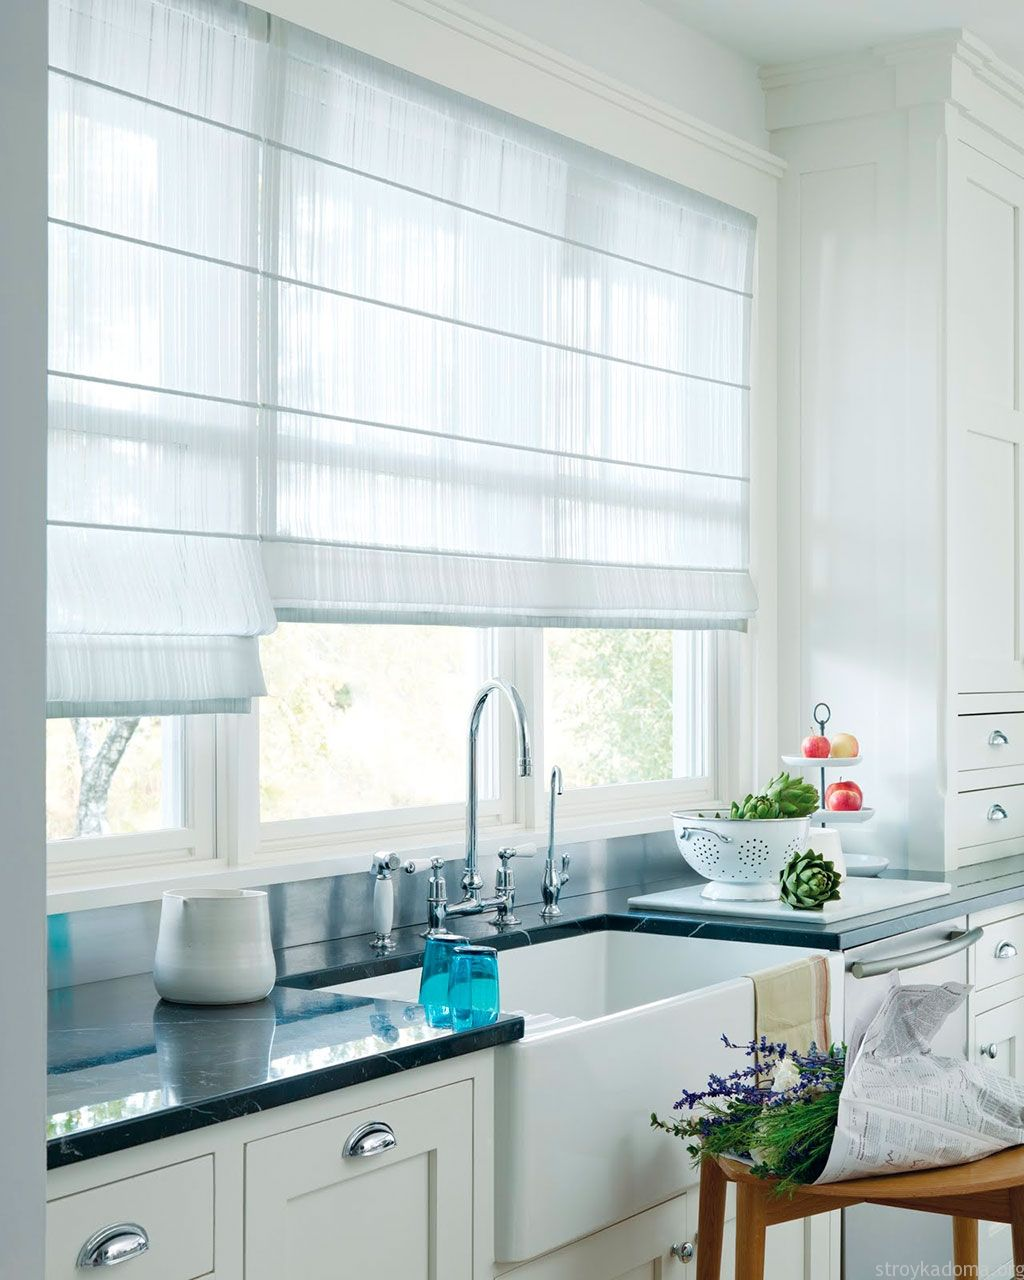 Шторы на кухню: белые кассетные жалюзи